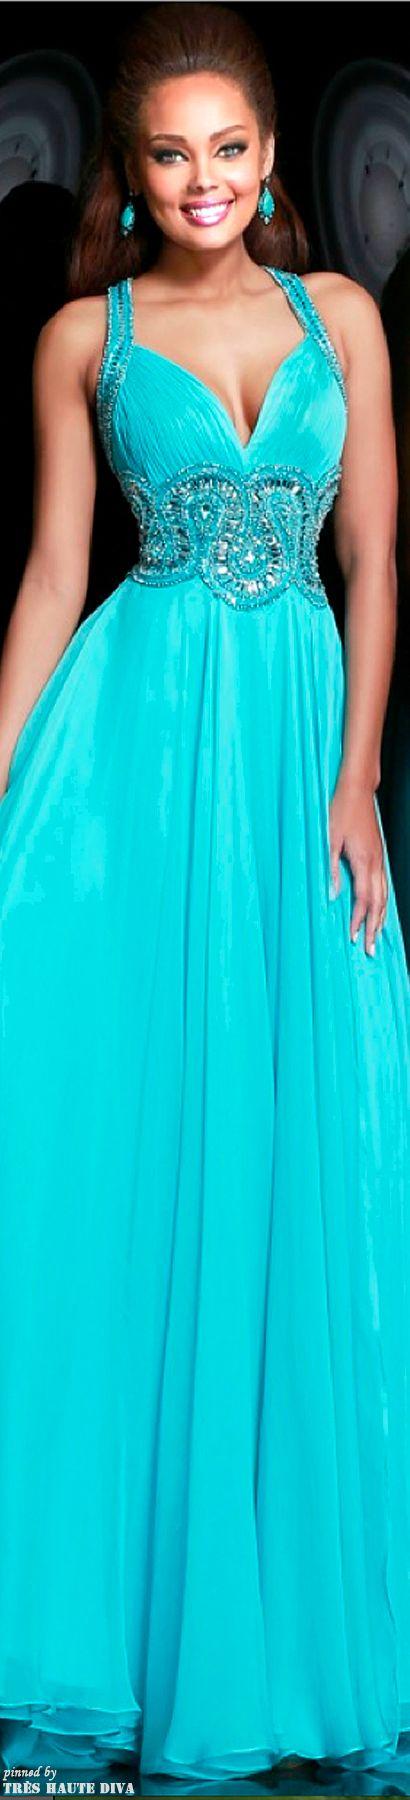 Aqua gown by Sherri Hill  www.SocietyOfWomenWhoLoveShoes.org https://www.facebook.com/SWWLS.Dallas